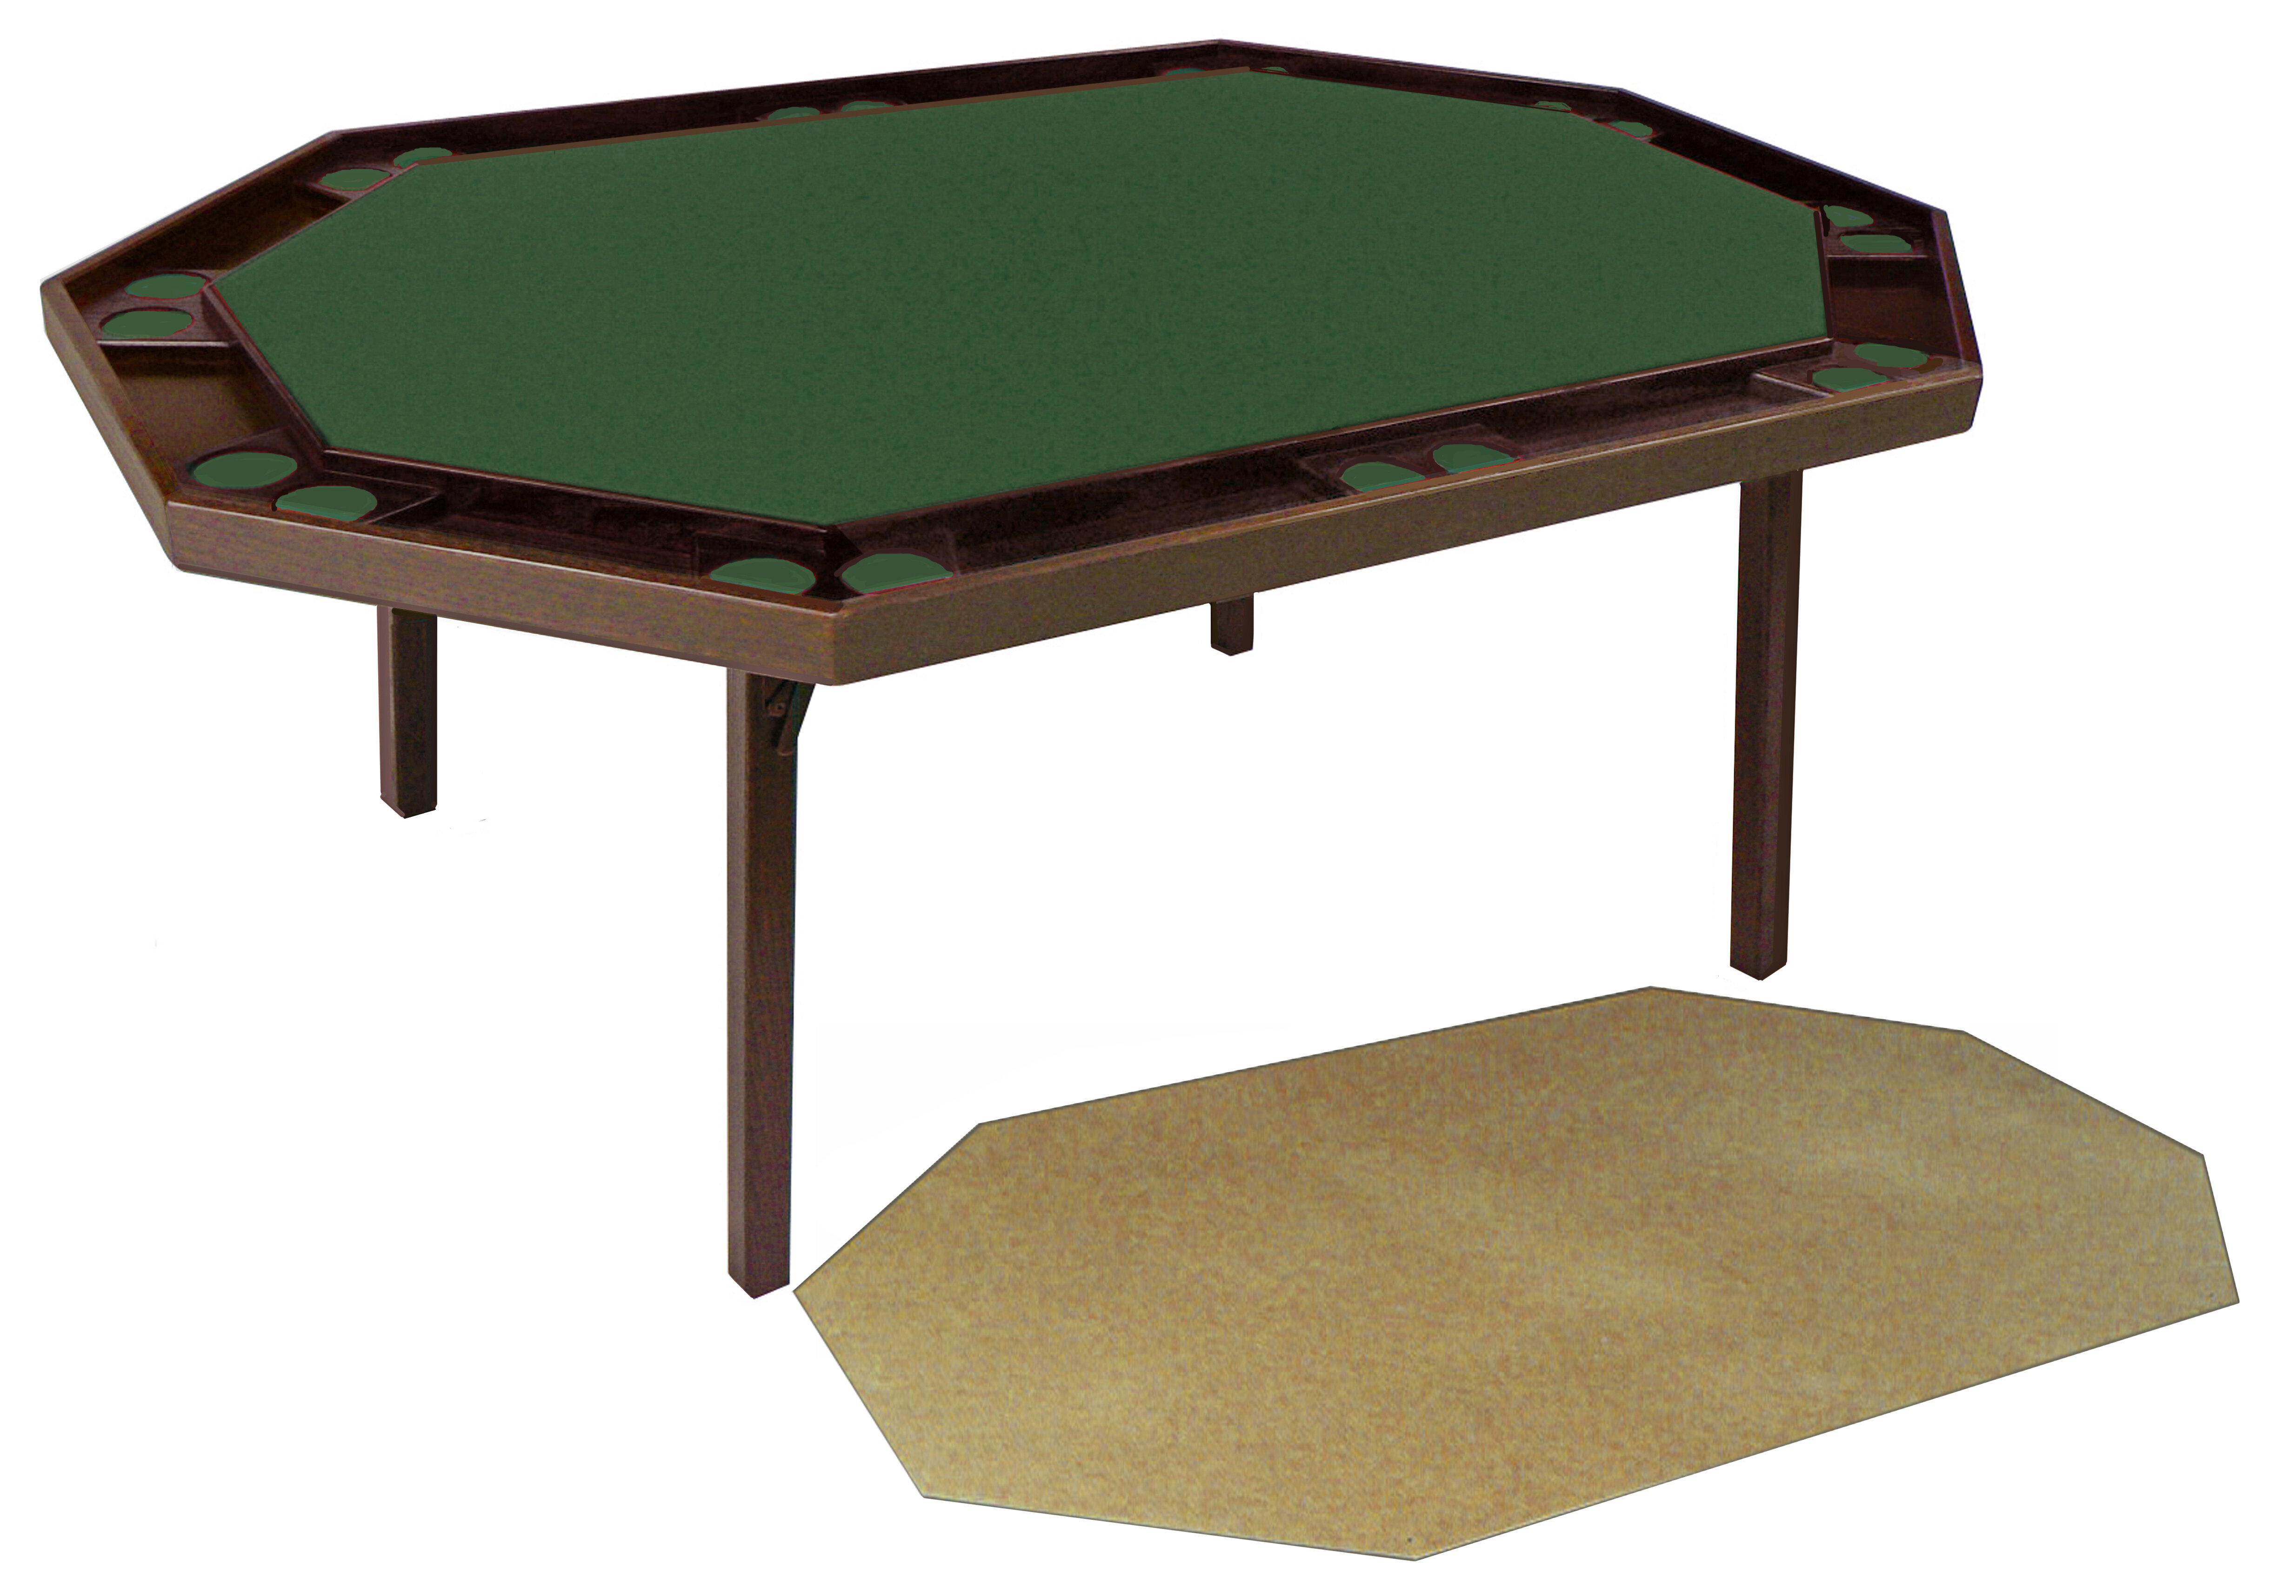 Kestell Furniture Poker & Card Tables You'll Love in 2021 | Wayfair